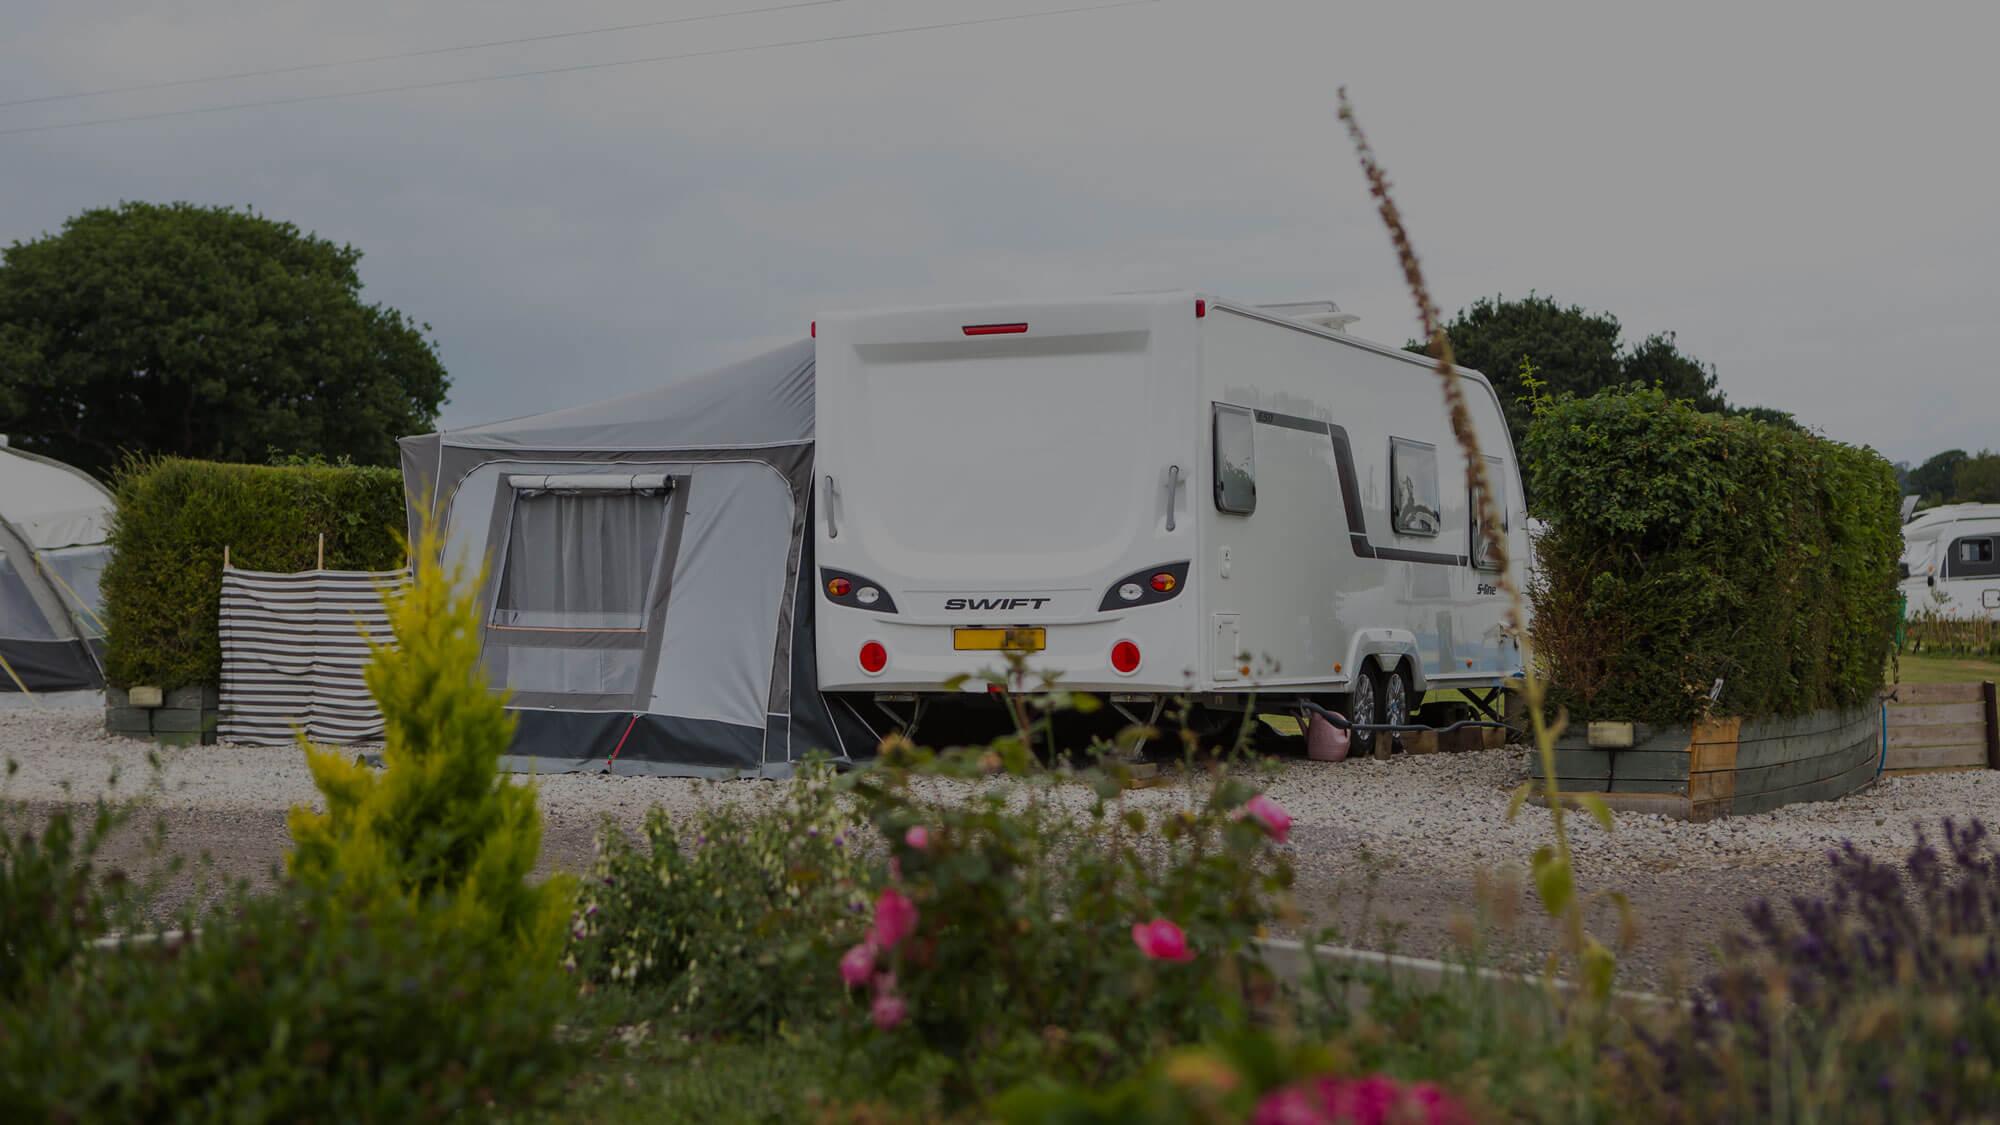 Dorset-hideaway-seasonal-pitches-slider